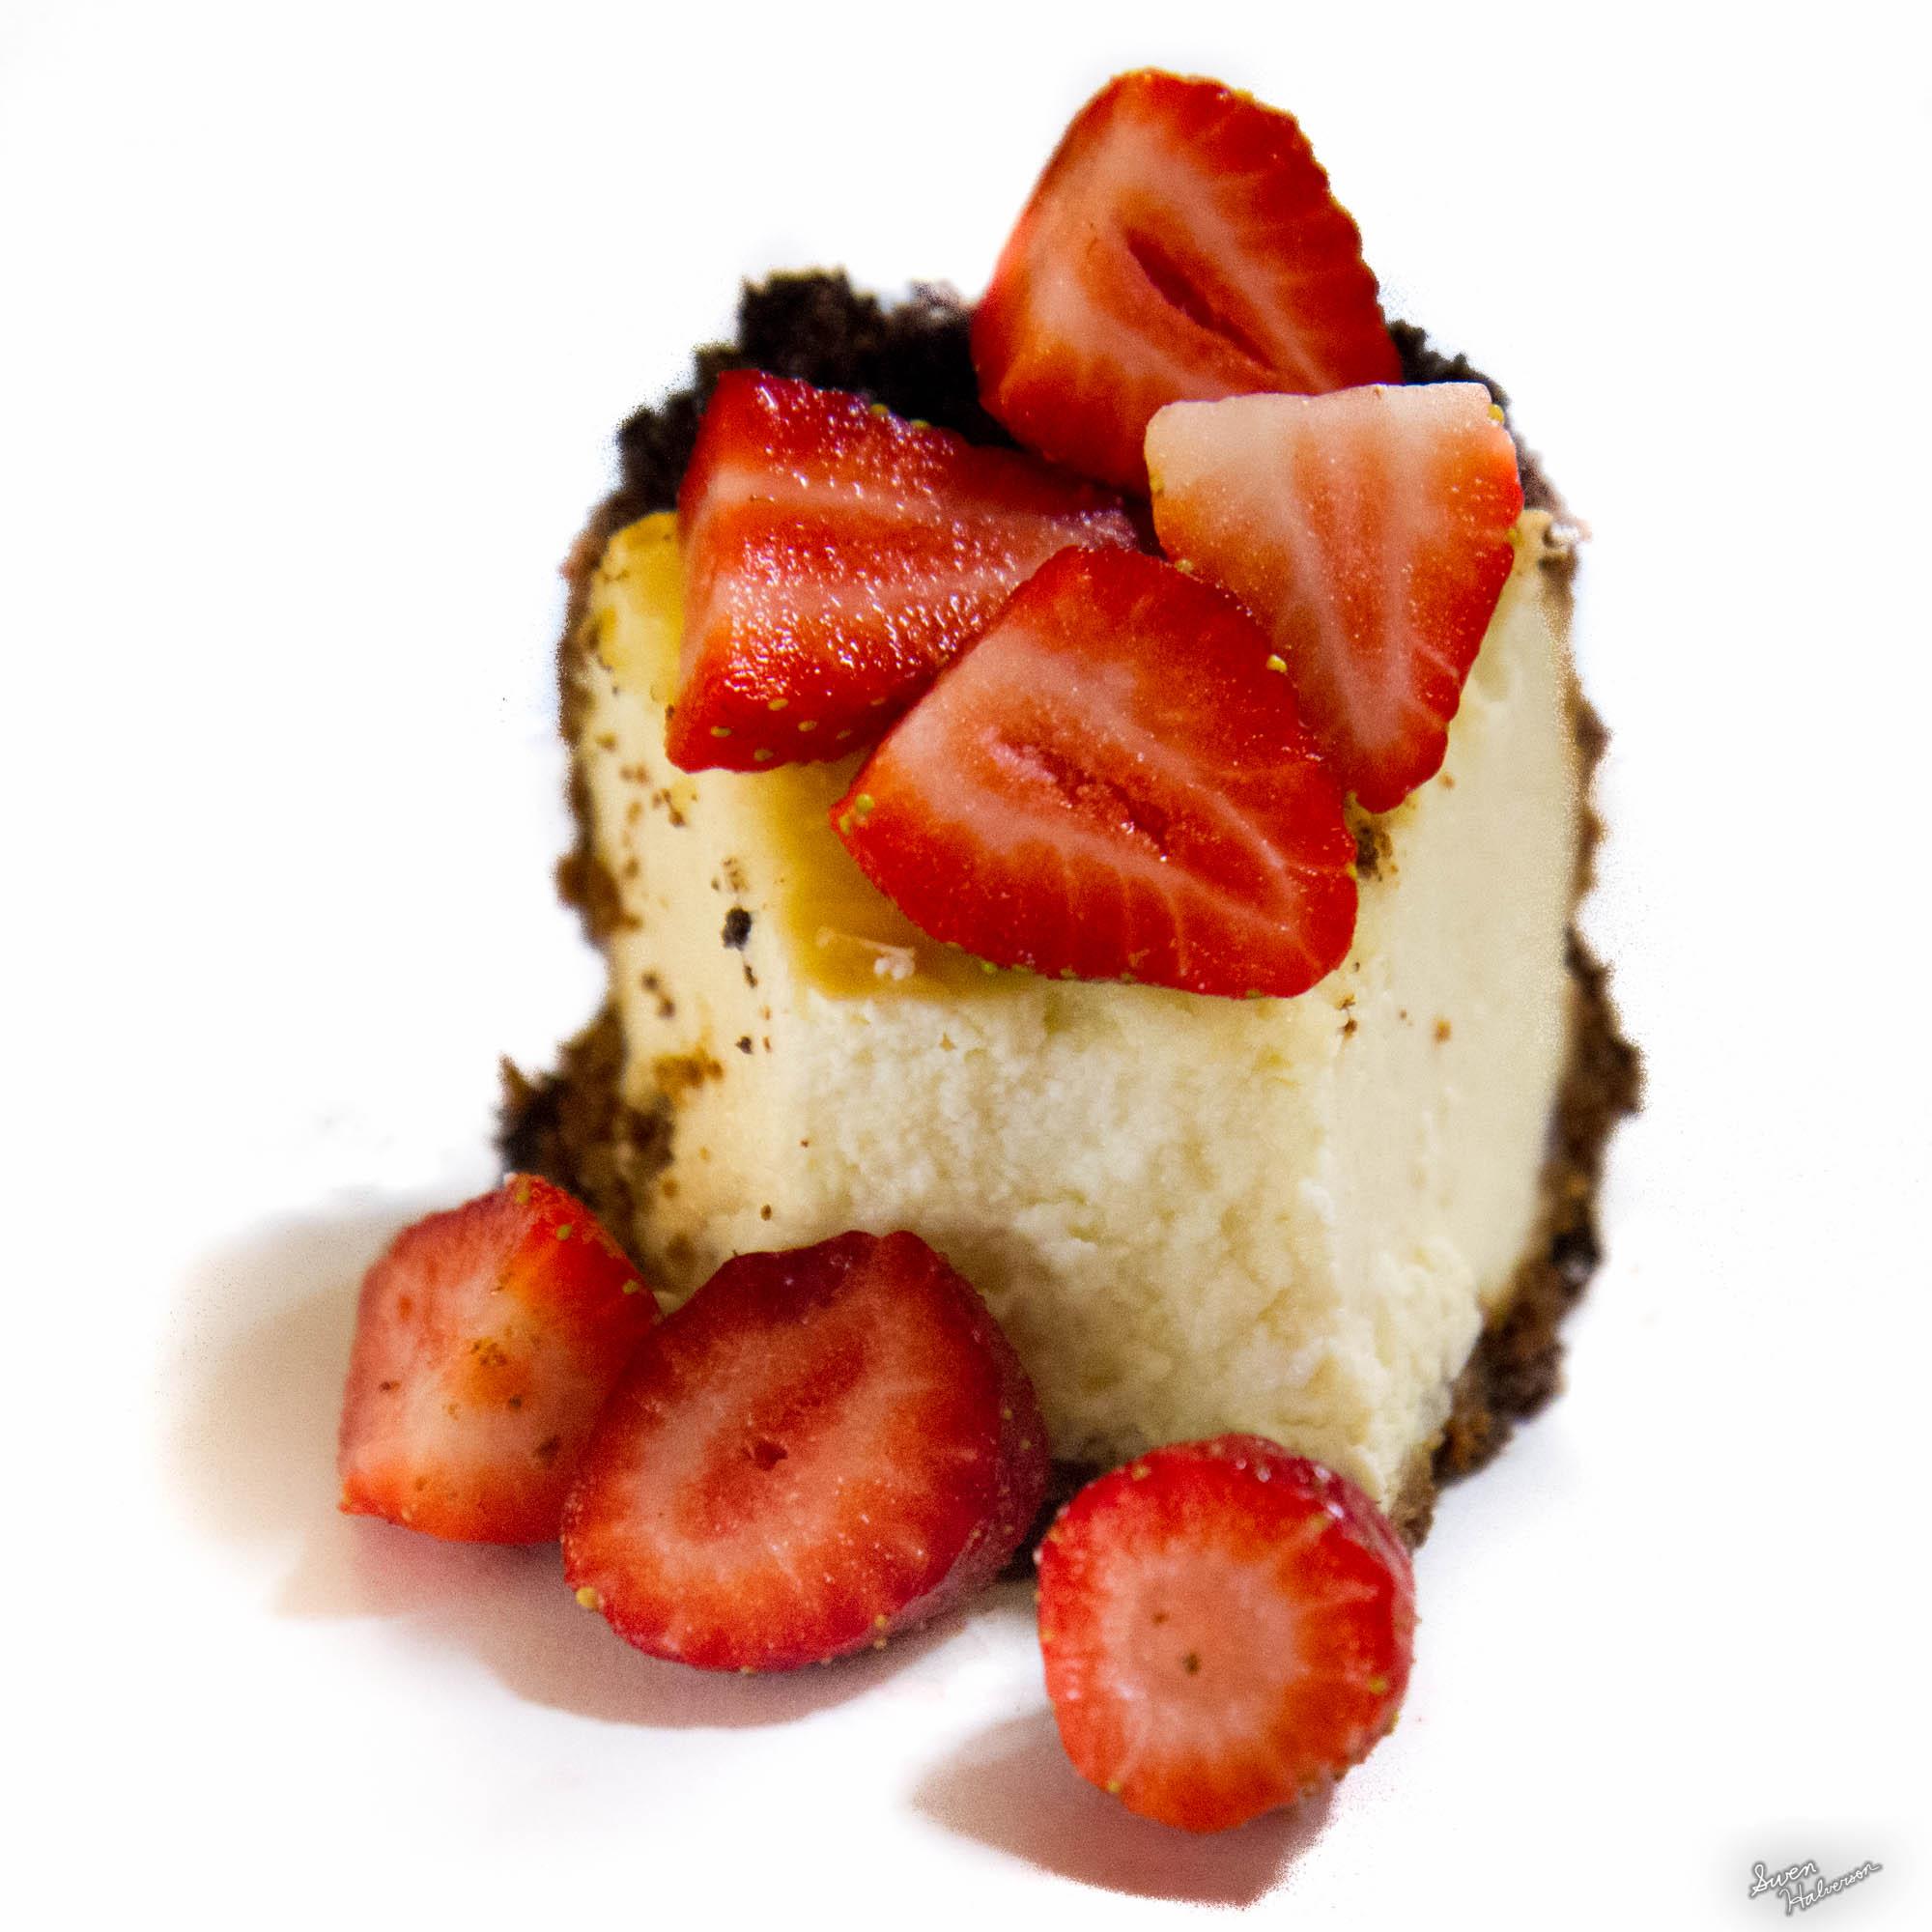 Theme: Miniature | Title: Strawberry Cheese Cake